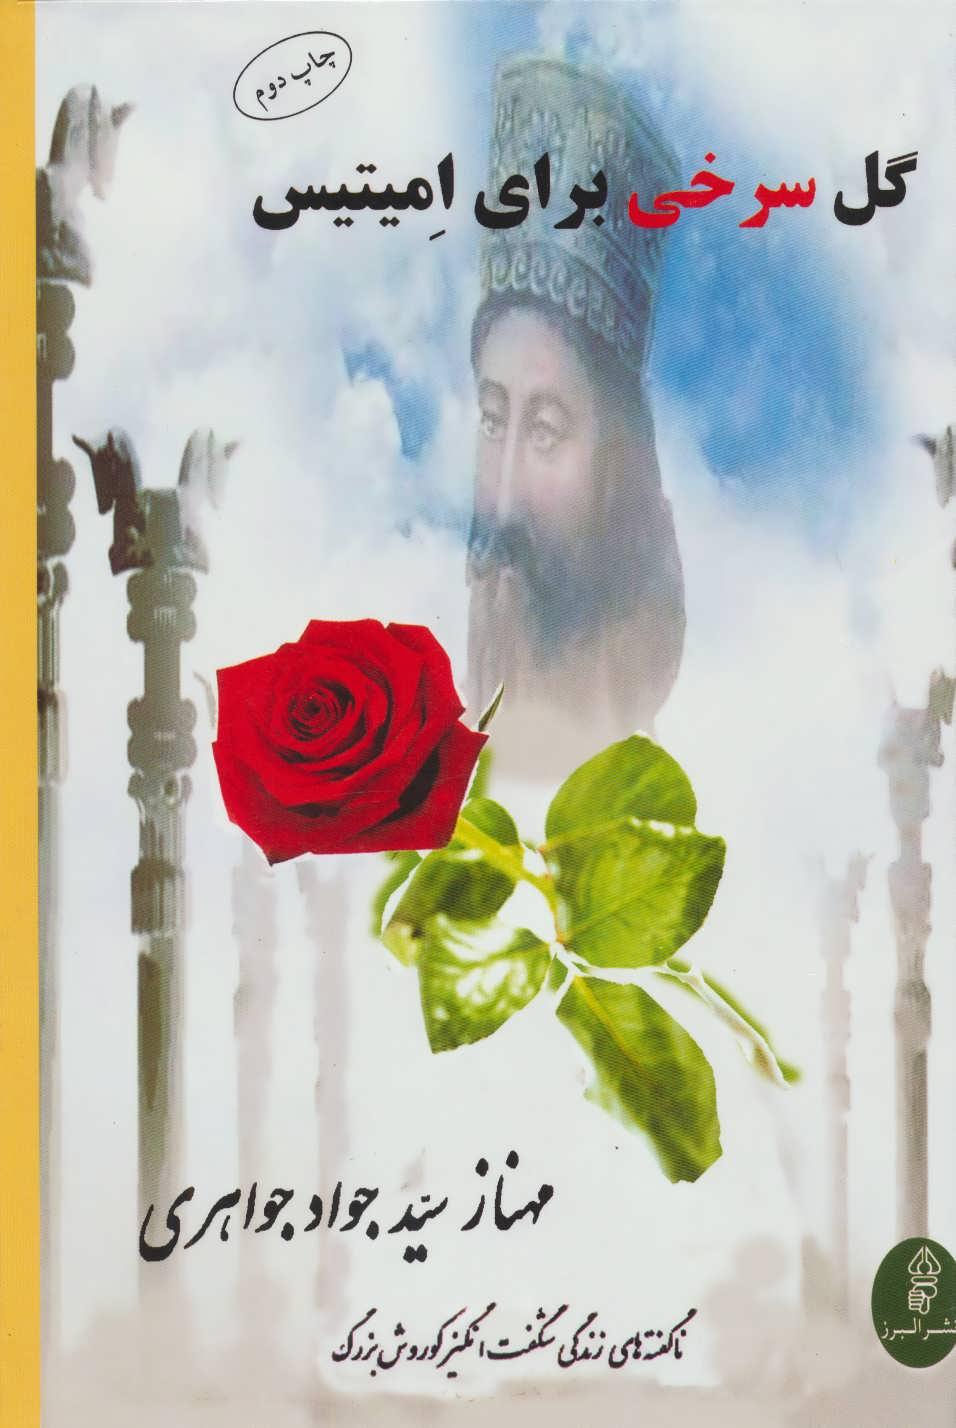 کتاب گل سرخی برای امیتیس